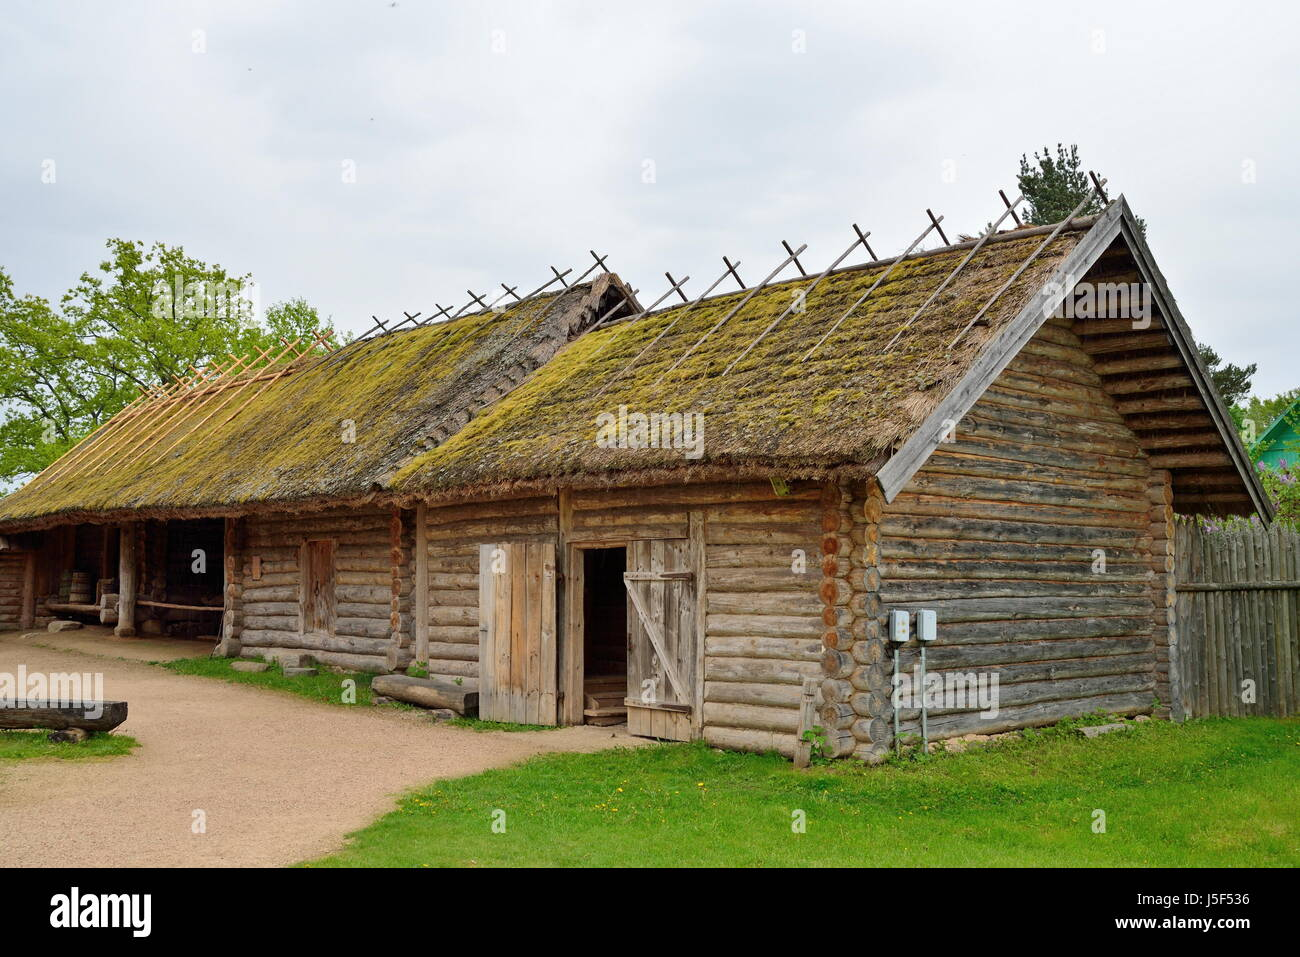 Old Russian log hut in Pushkin Mikhailovskoe summer cloudy day - Stock Image